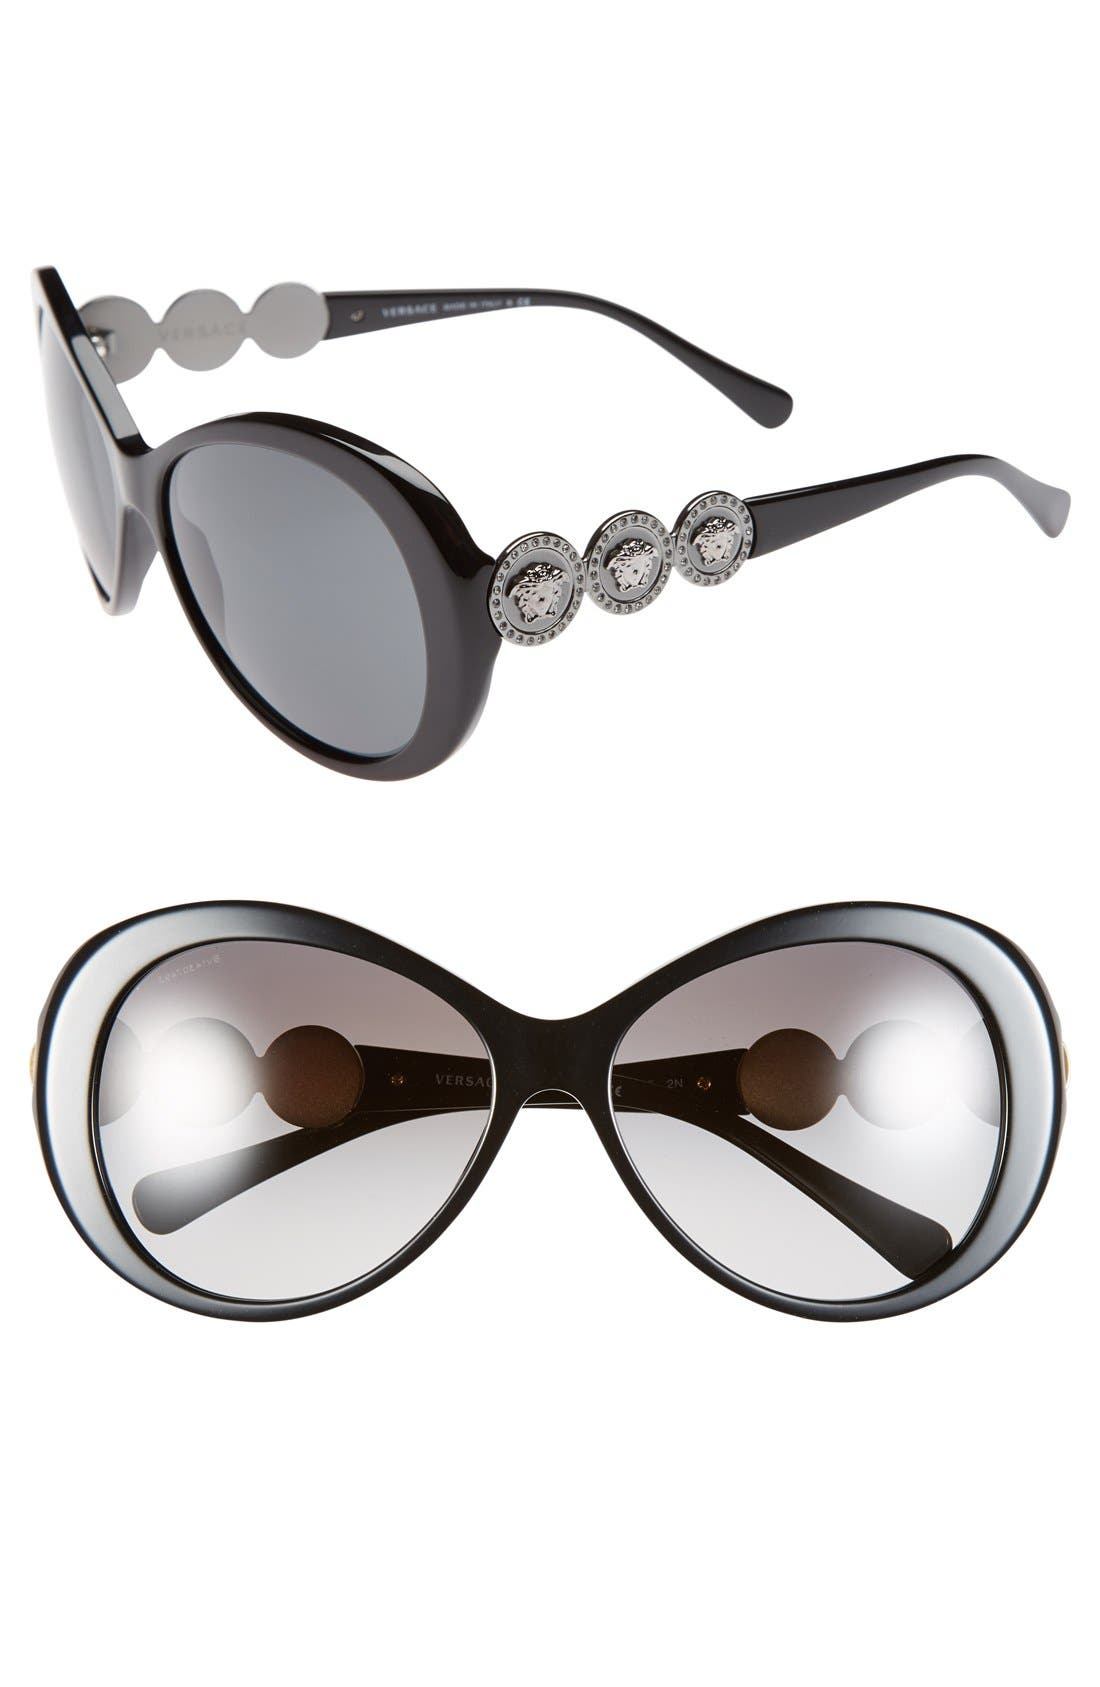 Alternate Image 1 Selected - Versace 58mm Round Sunglasses